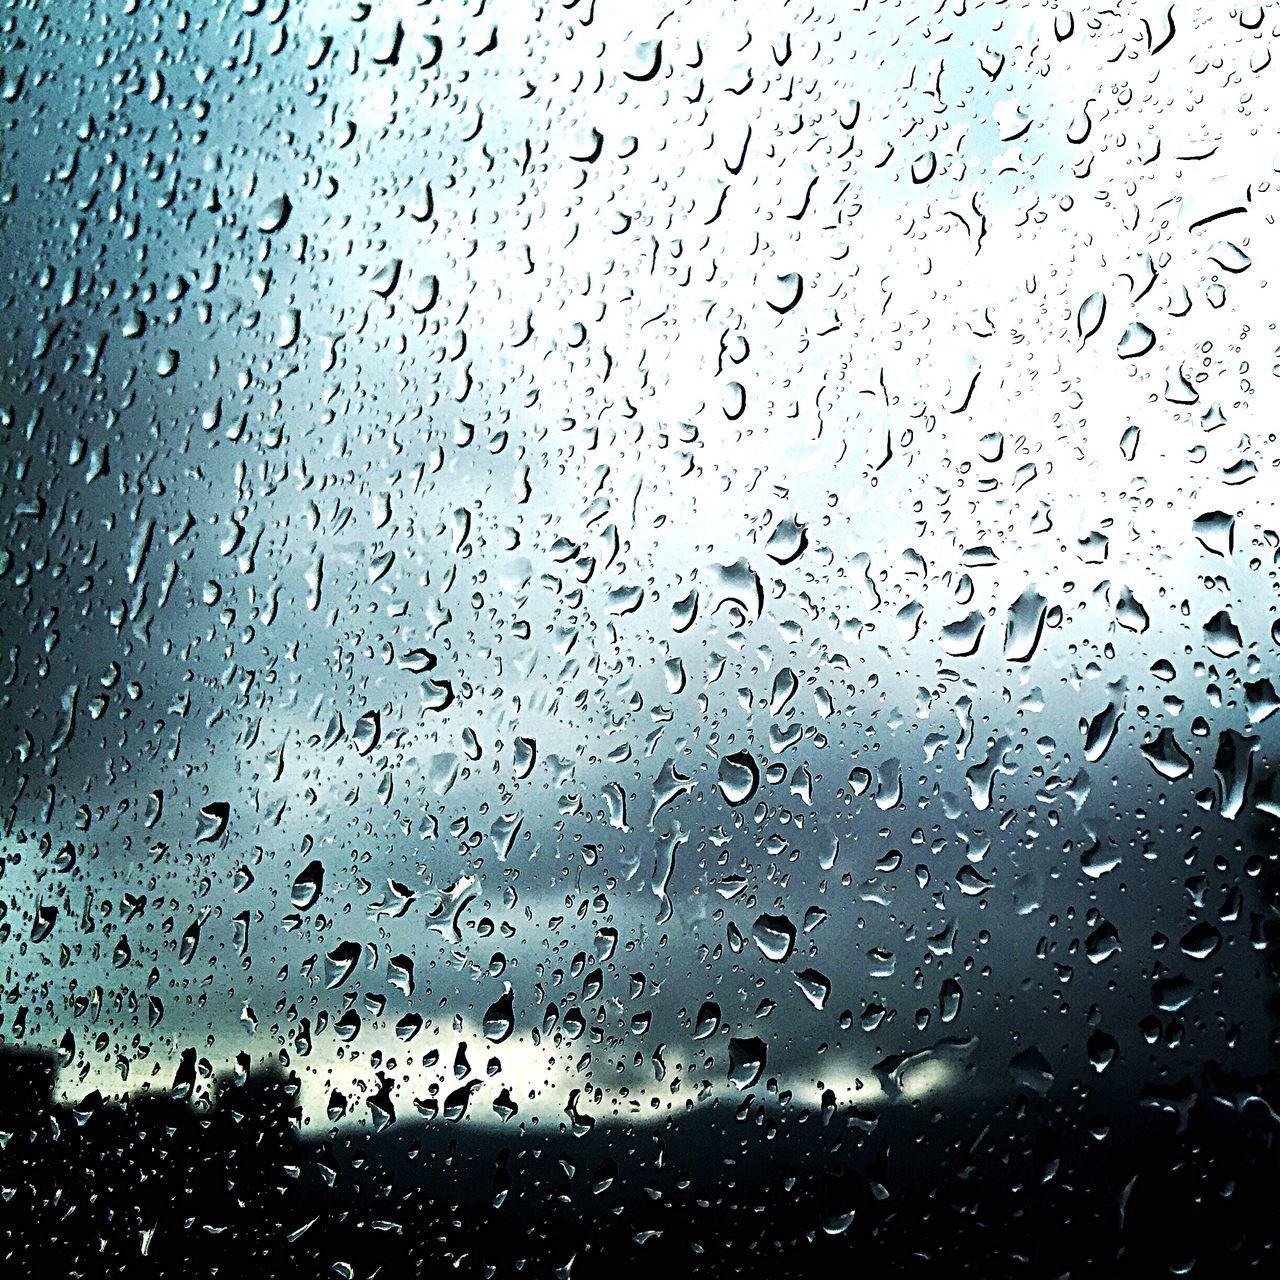 Raindrops On The Window New Taipei City Blurvision Rain Stormy Showcase July